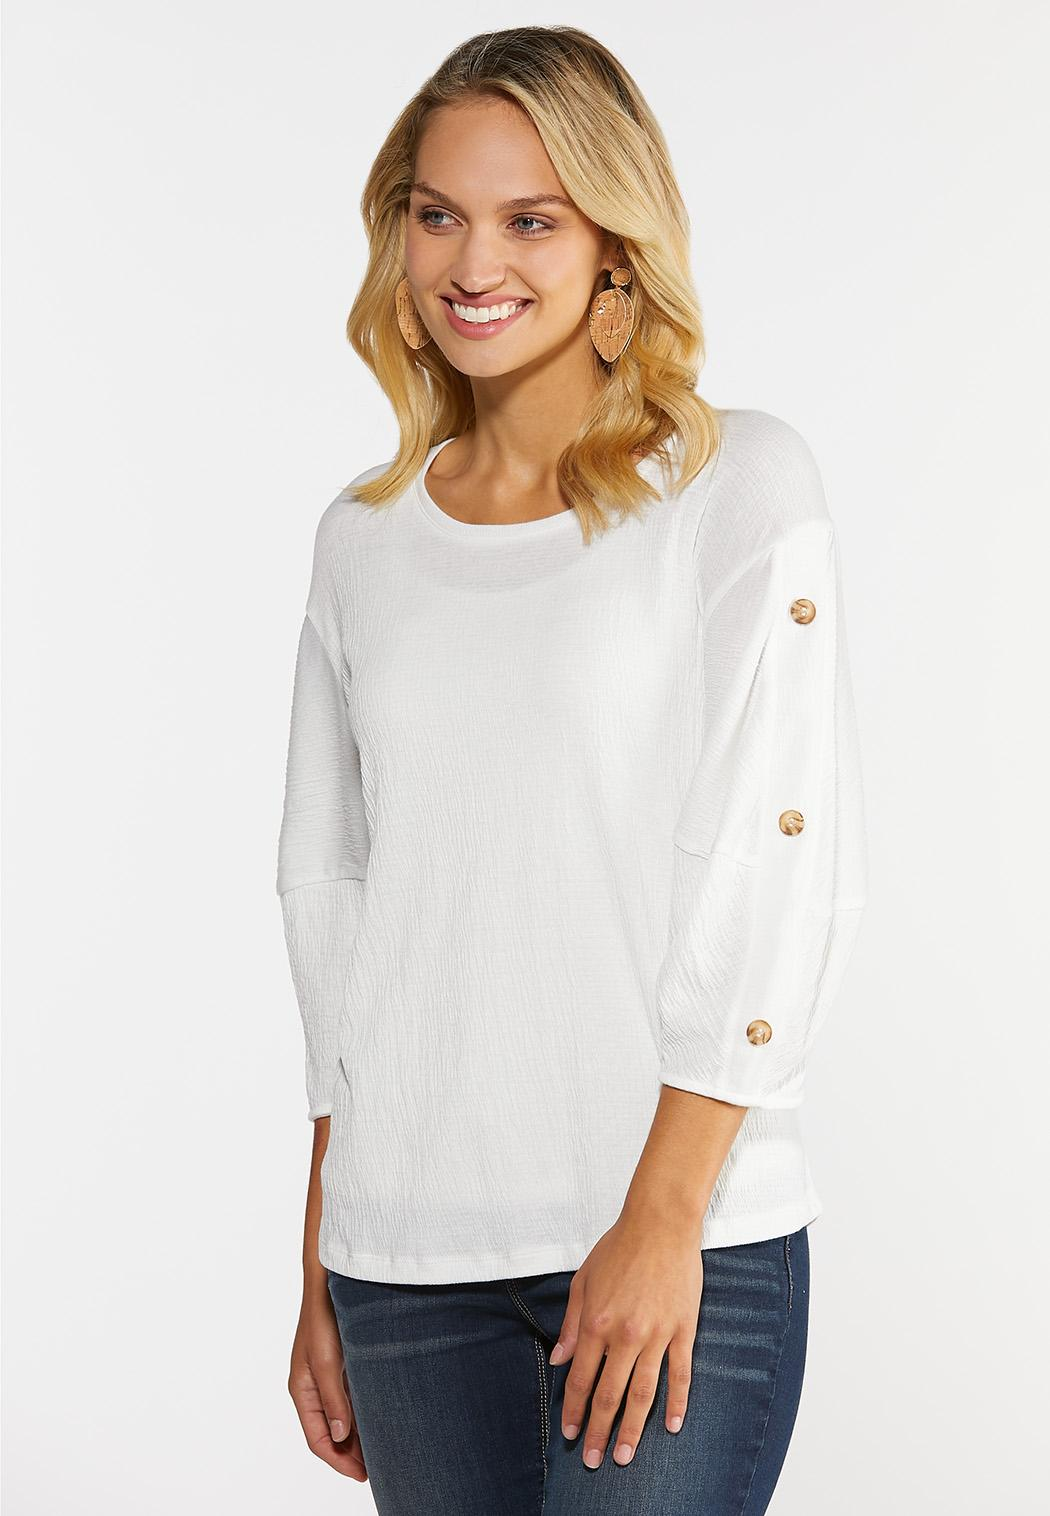 Textured Button Sleeve Top